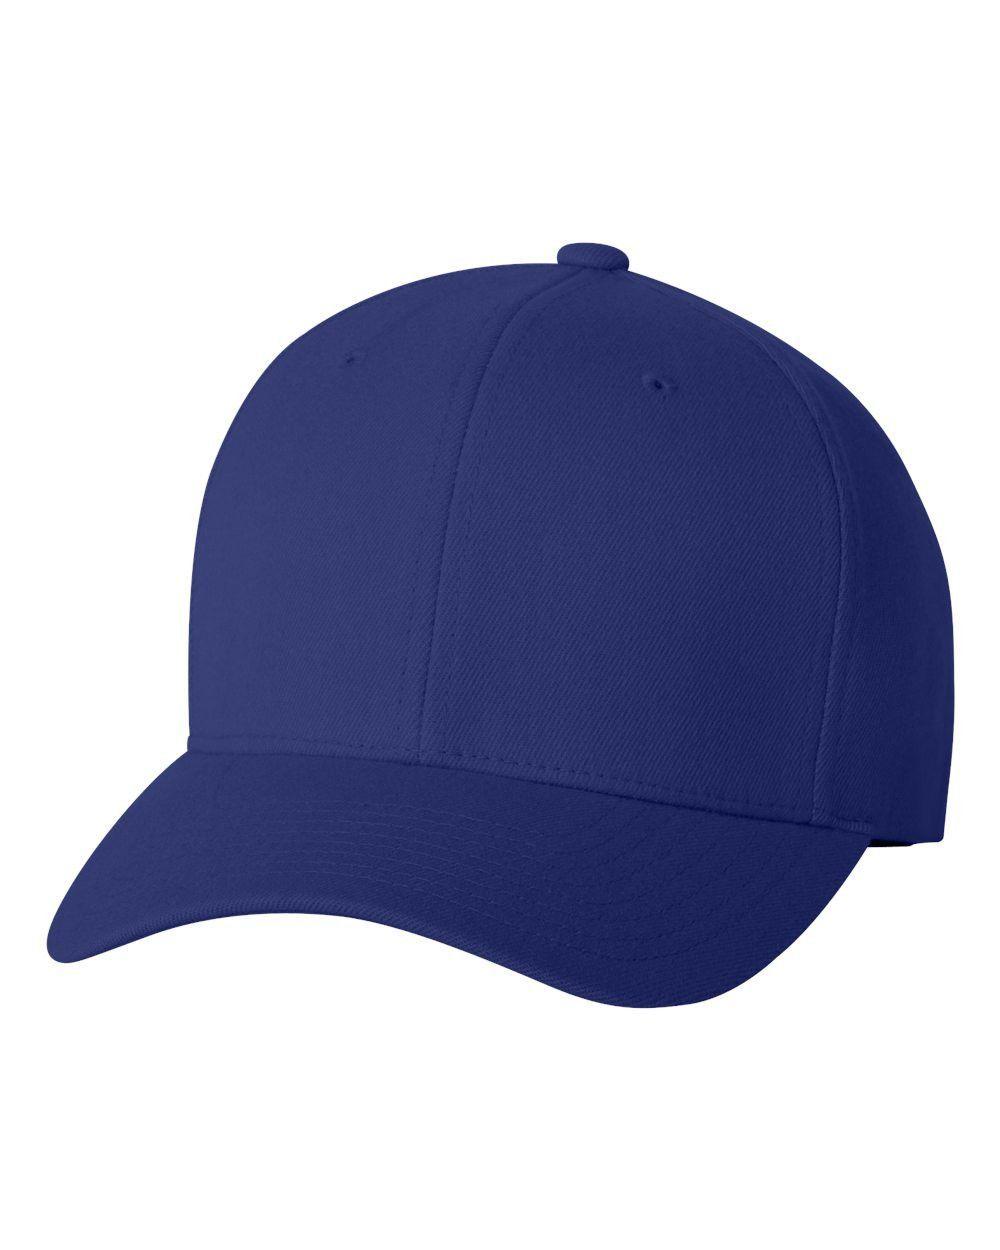 Flexfit - Structured Wool Cap - 6477